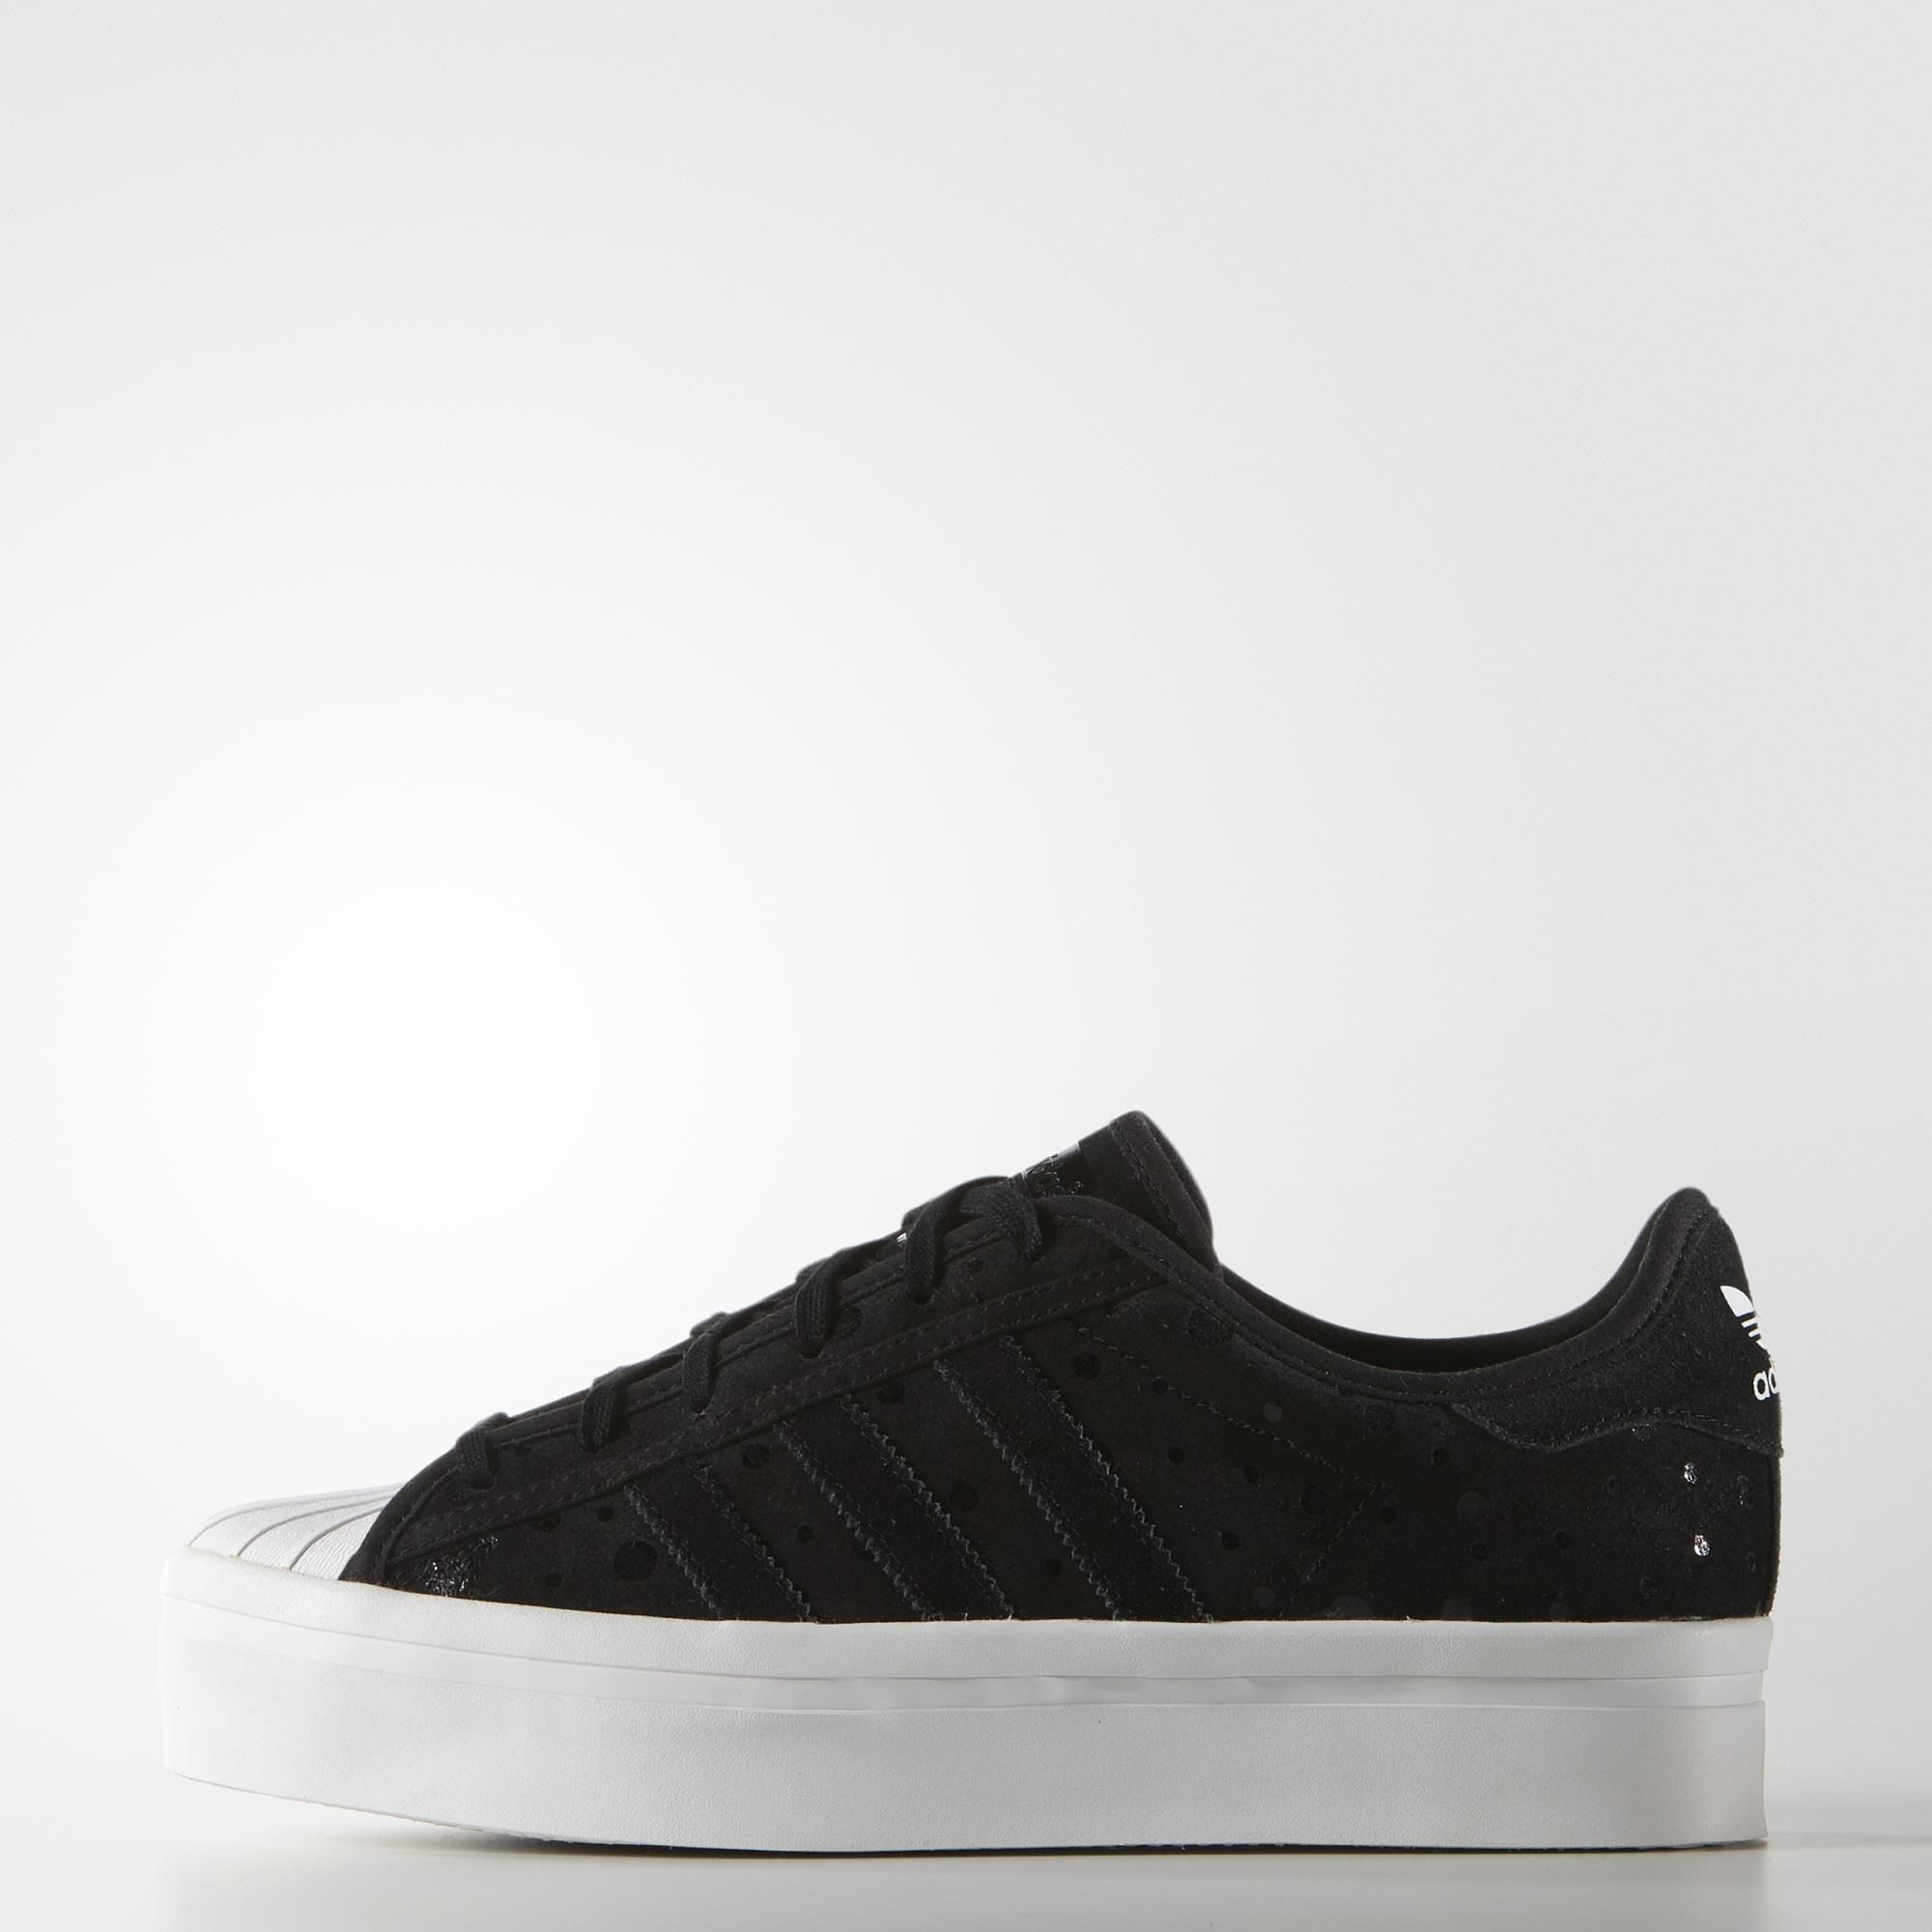 Adidas superstar rize scarpe nere le scarpe adidas regionali